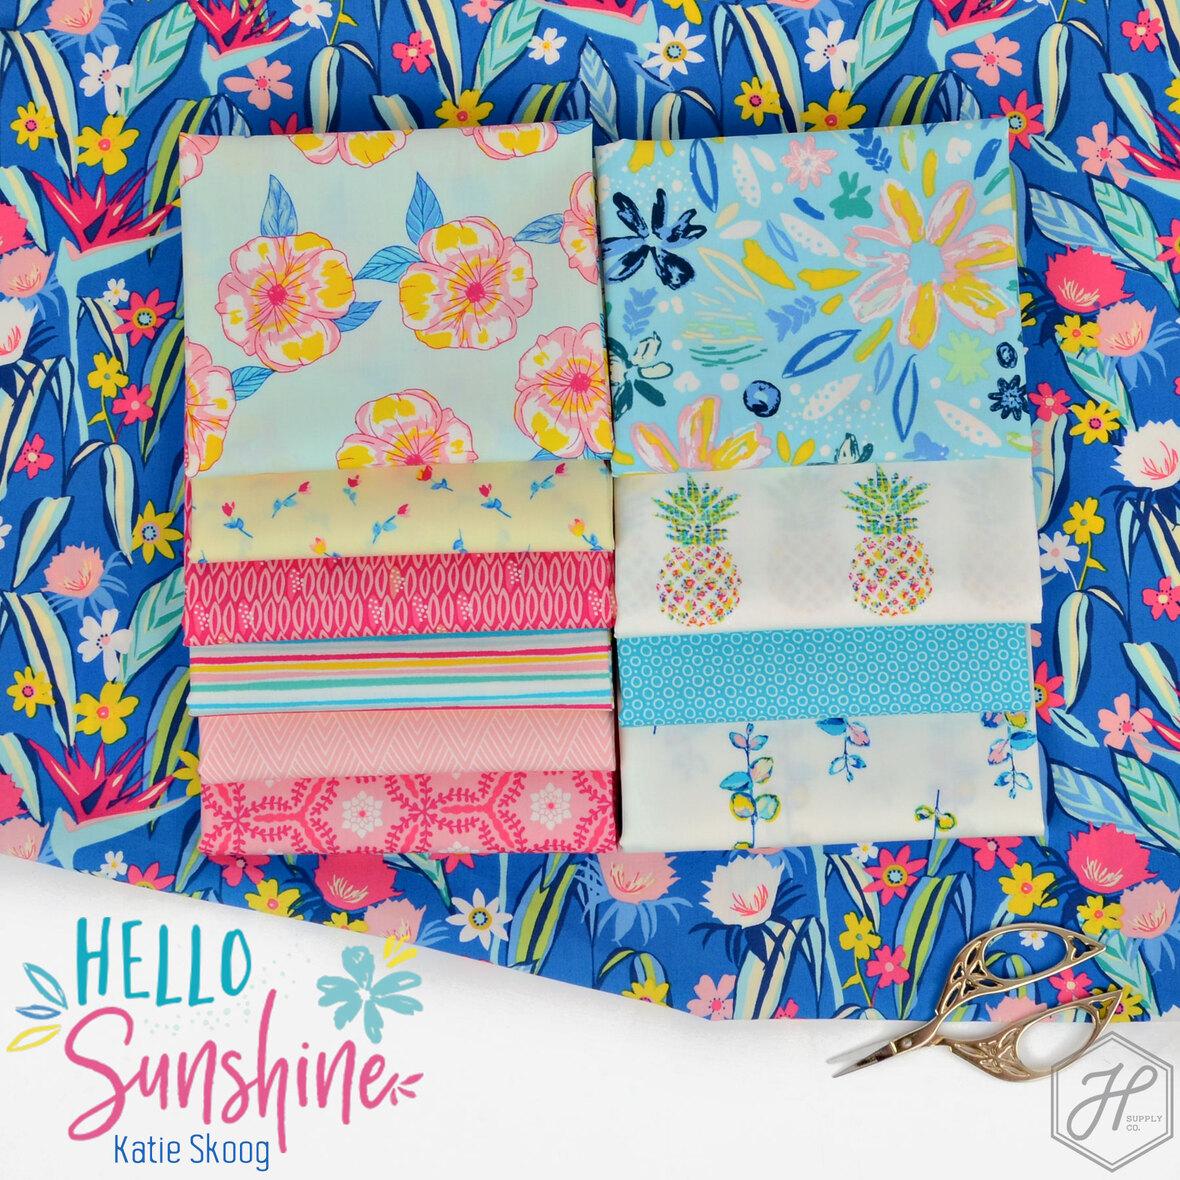 Hello-Sunshine-Katie-Skoog-Fabric-at-Hawthorne-Supply-Co